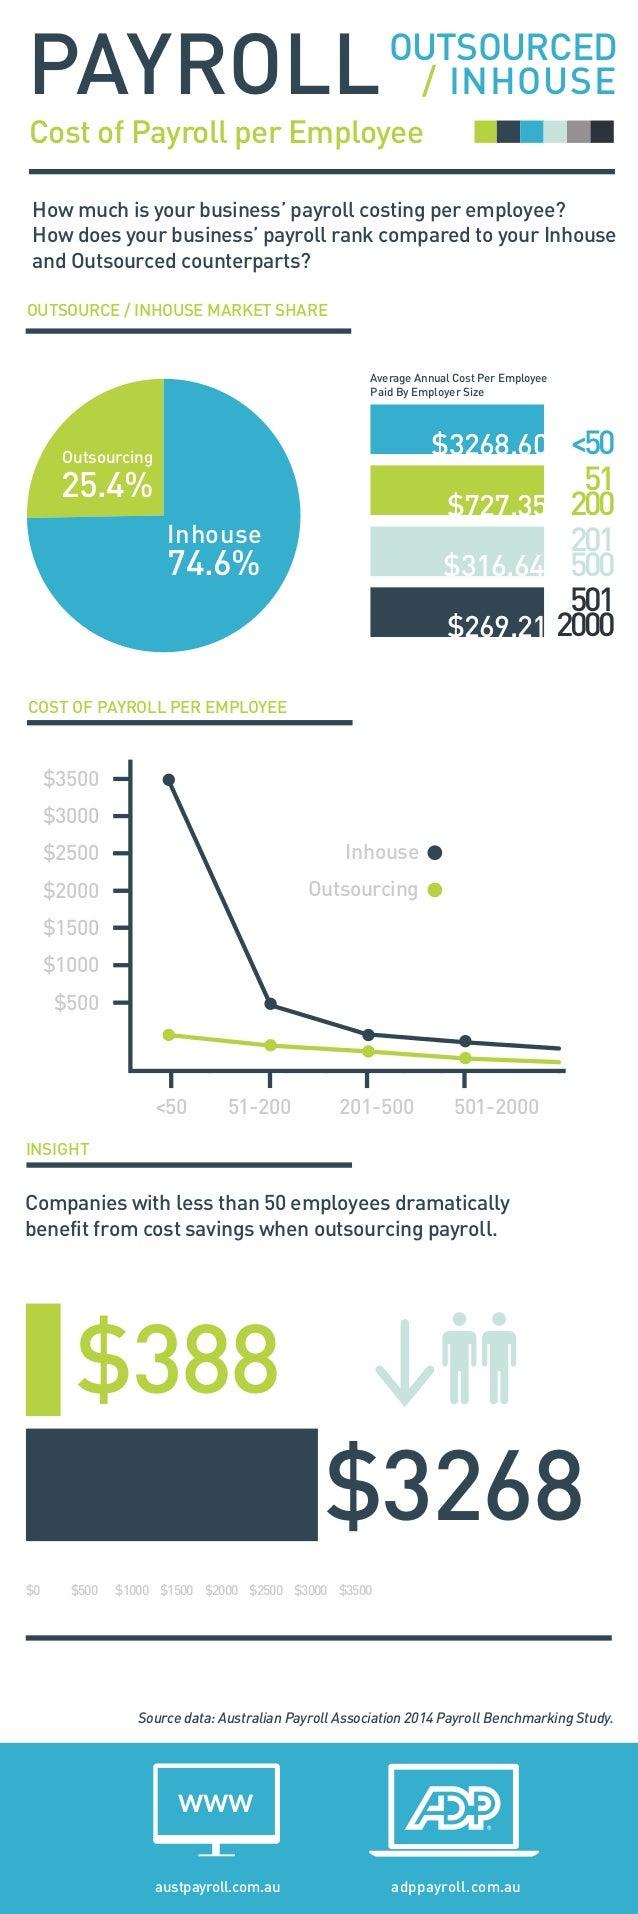 Cost of Payroll per Employee PAYROLL adppayroll.com.auaustpayroll.com.au www OUTSOURCED / INHOUSE OUTSOURCE / INHOUSE MARK...